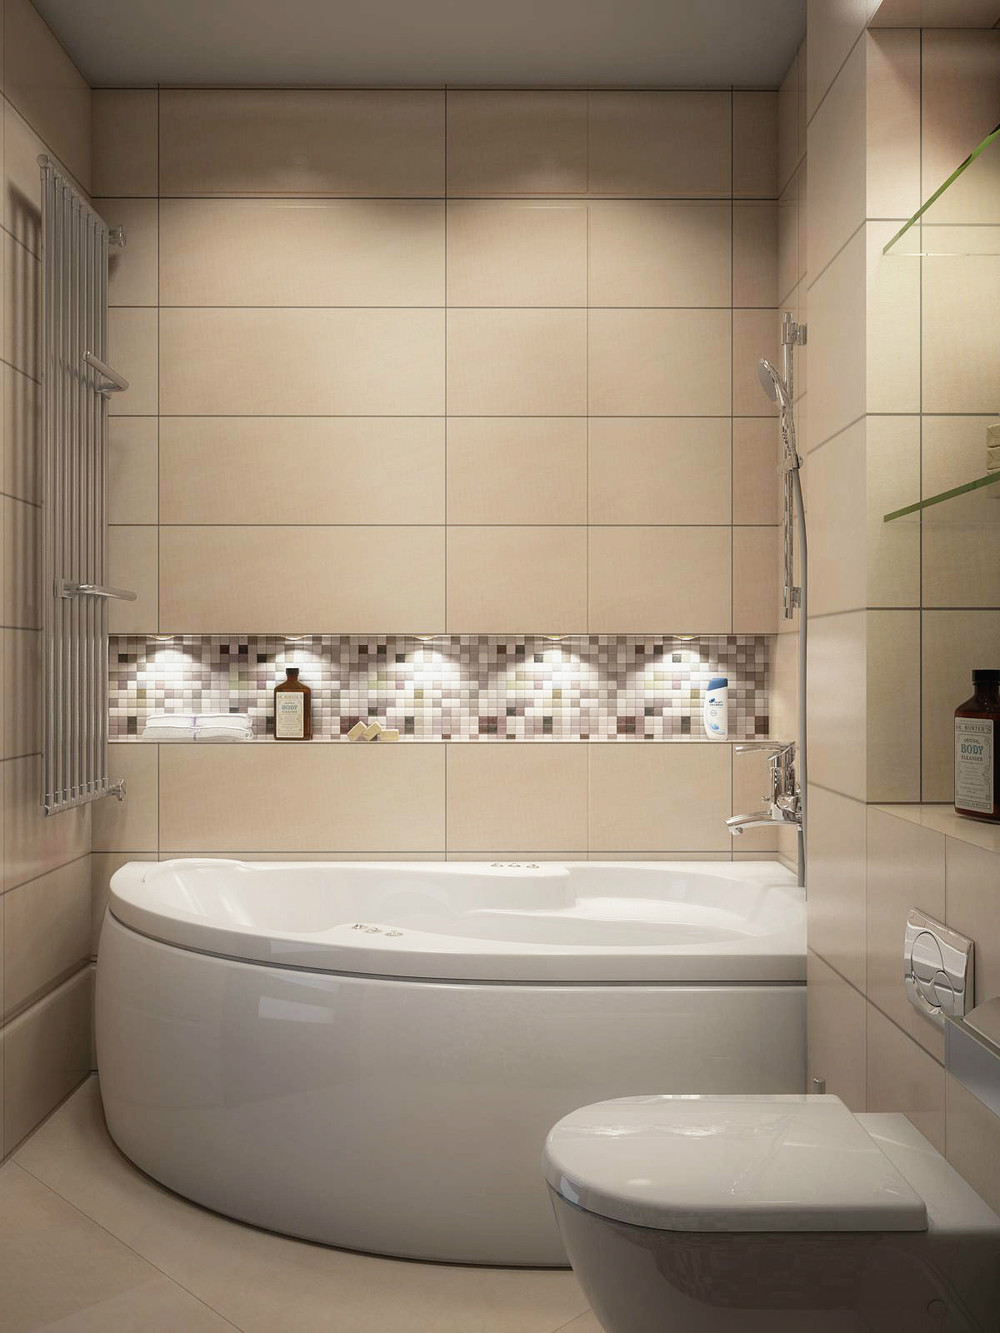 Бежево-белая ванная комната с мозаикой